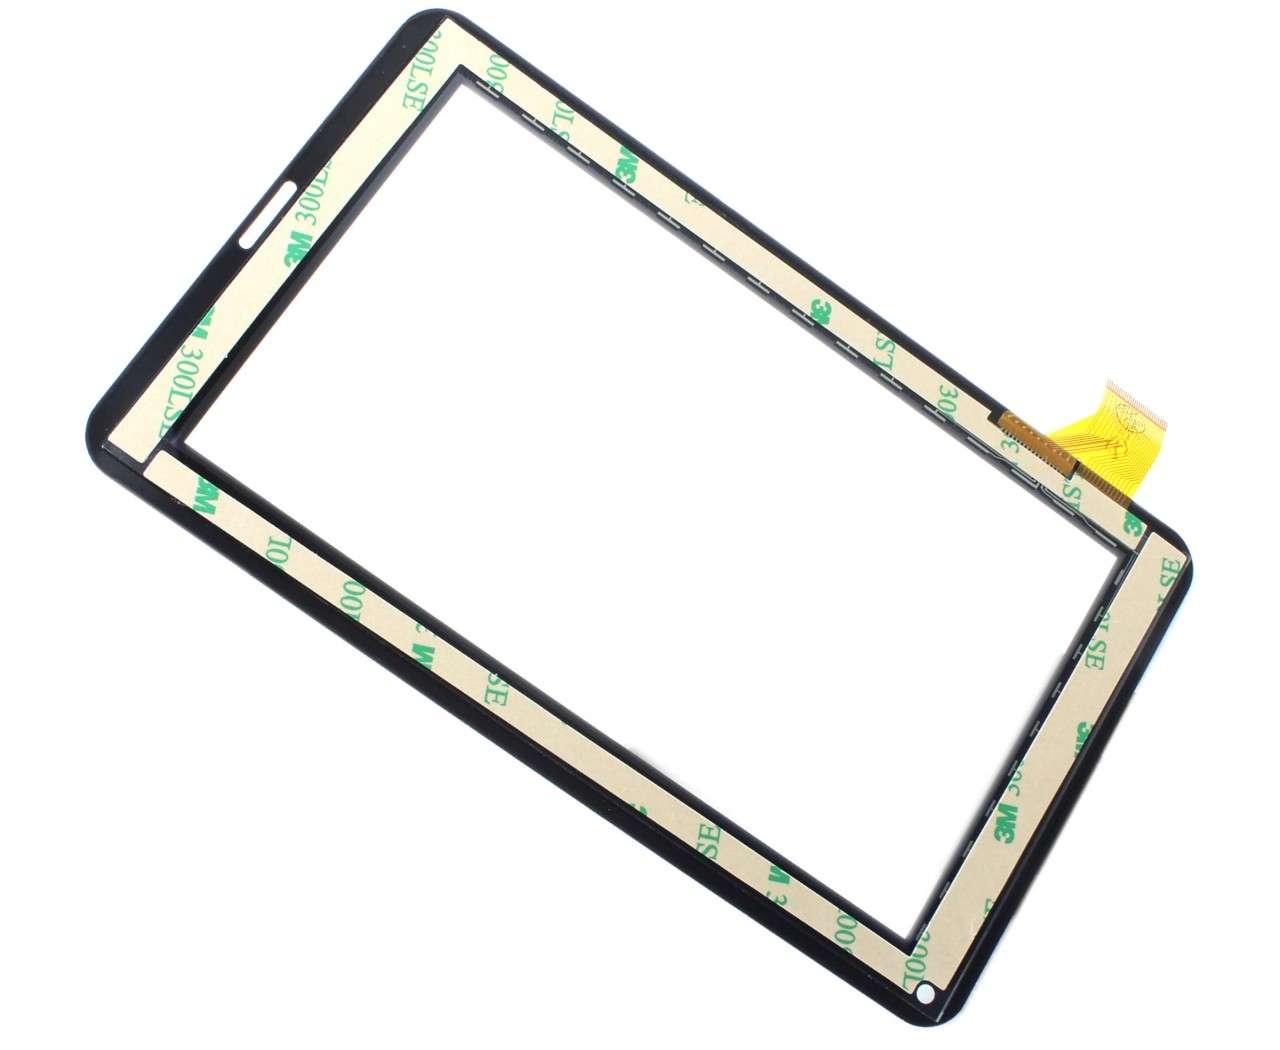 Touchscreen Digitizer Quer KOMO701 Geam Sticla Tableta imagine powerlaptop.ro 2021